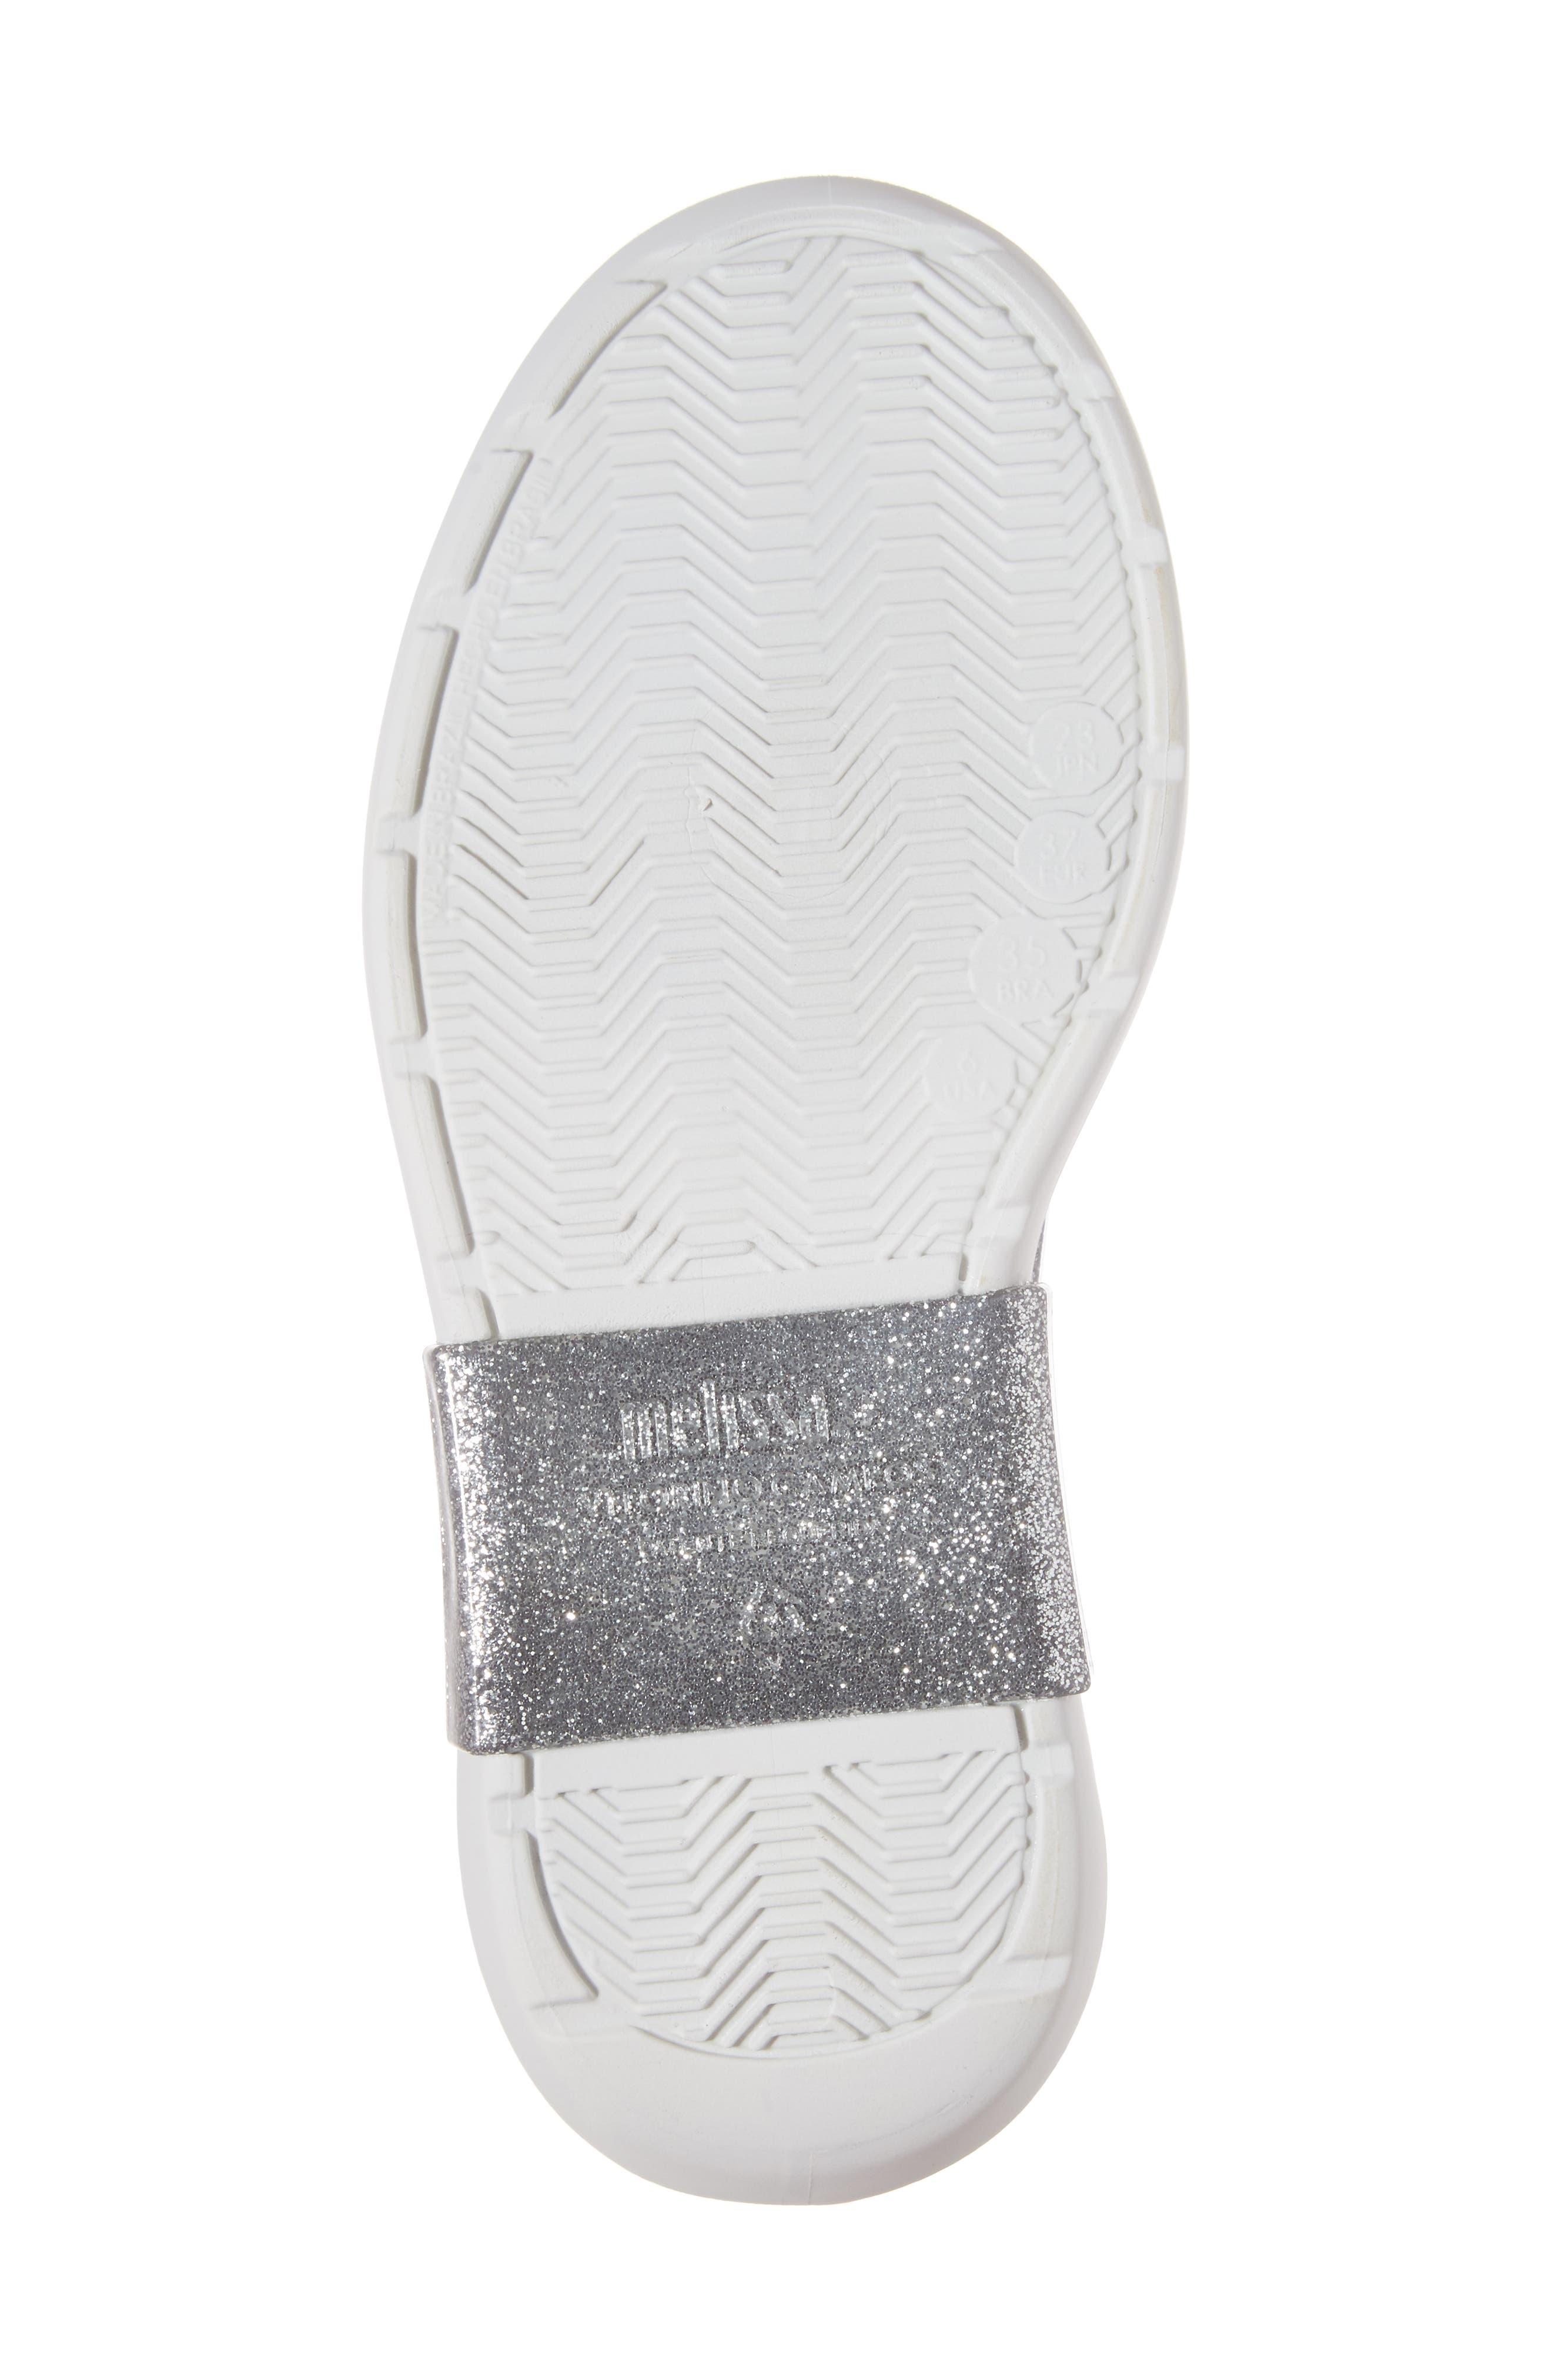 Grunge Vitorino Water Resistant Oxford,                             Alternate thumbnail 6, color,                             Silver Glitter White